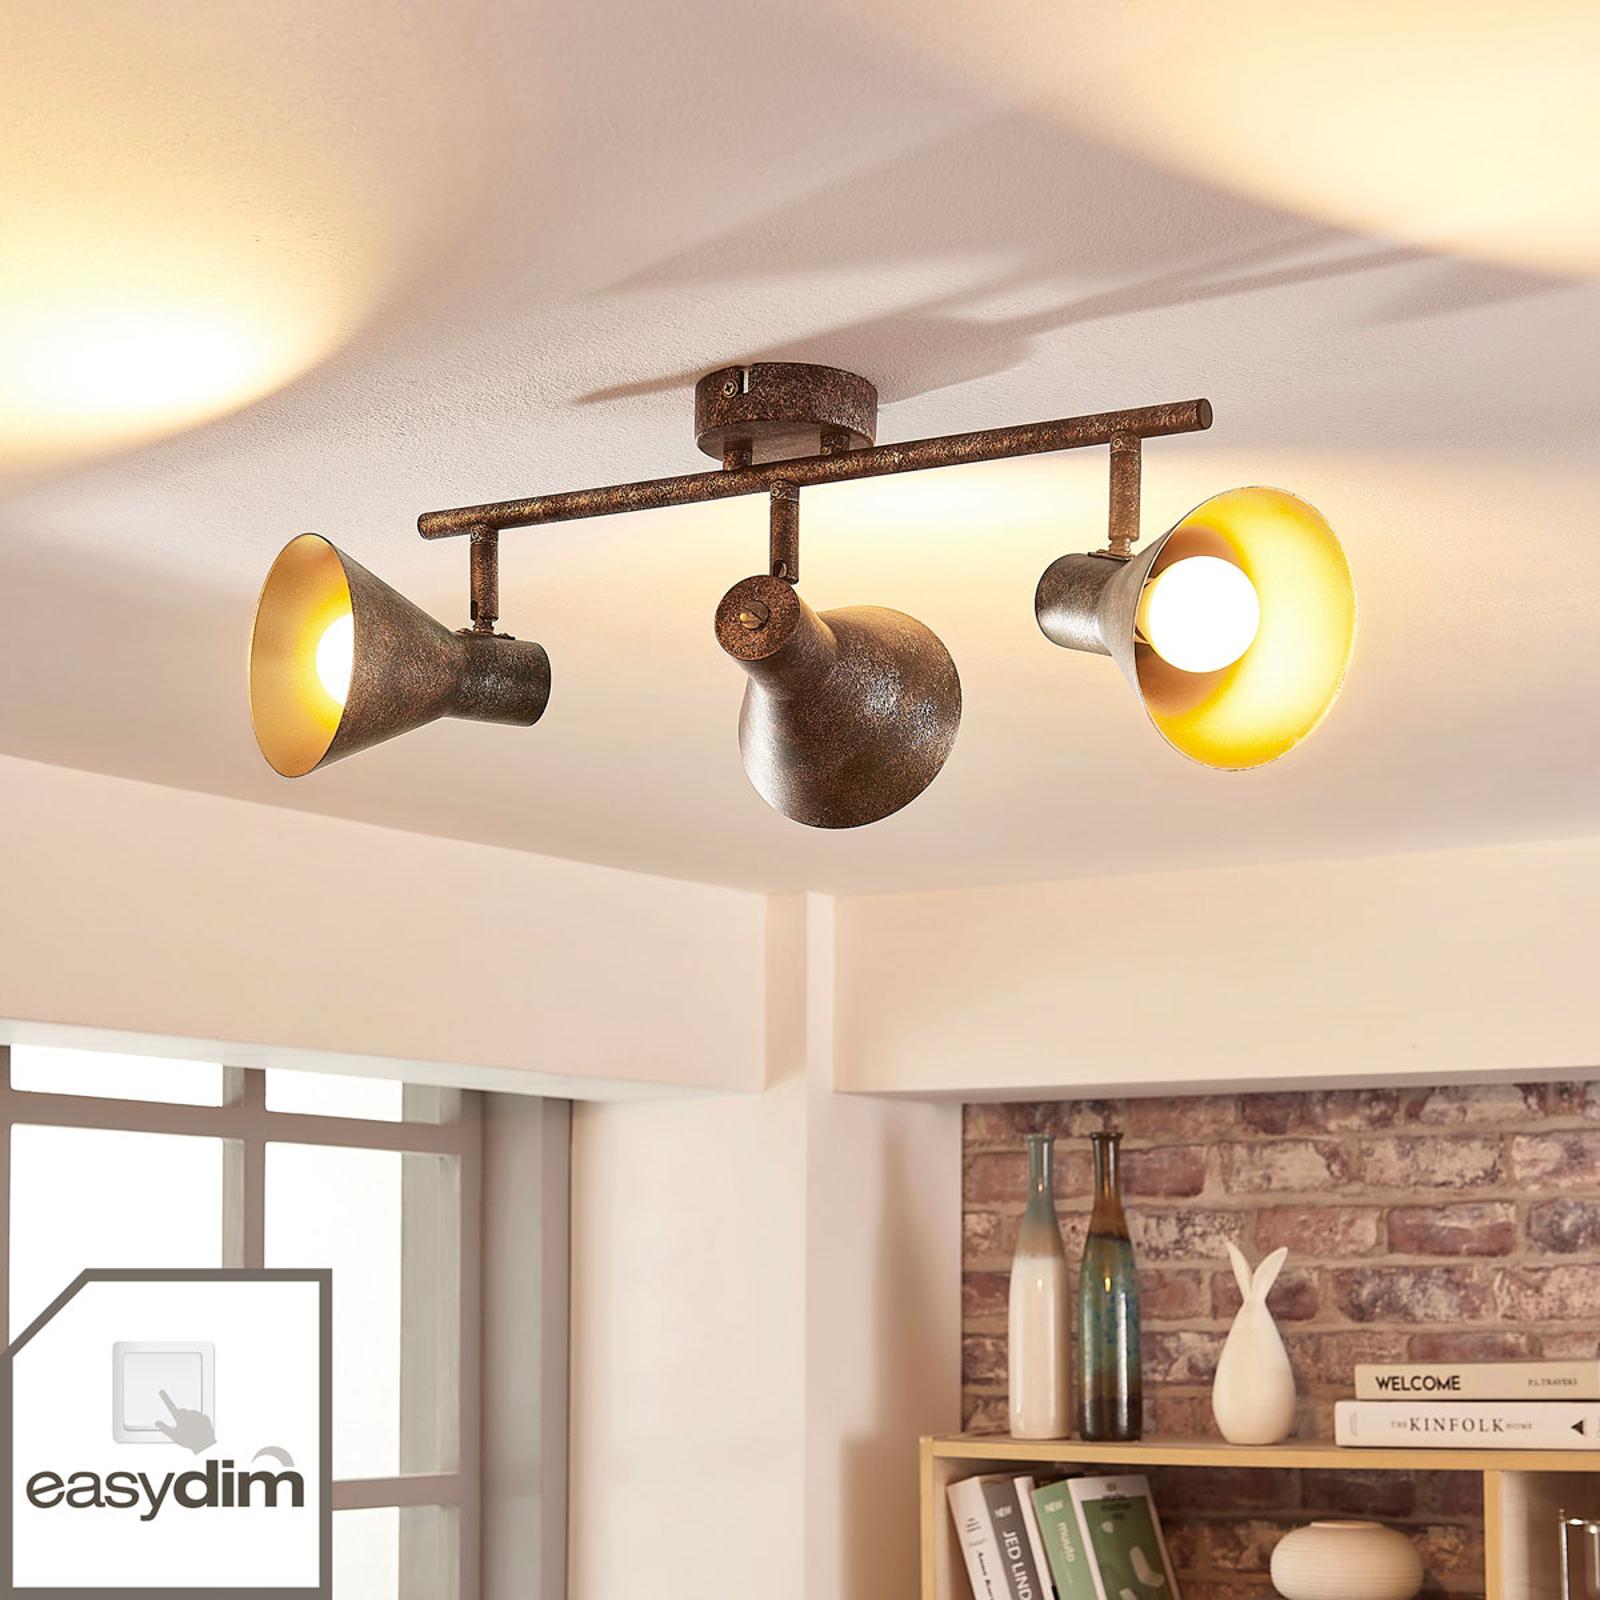 Zera - avlang LED-taklampe med Easydim-pærer